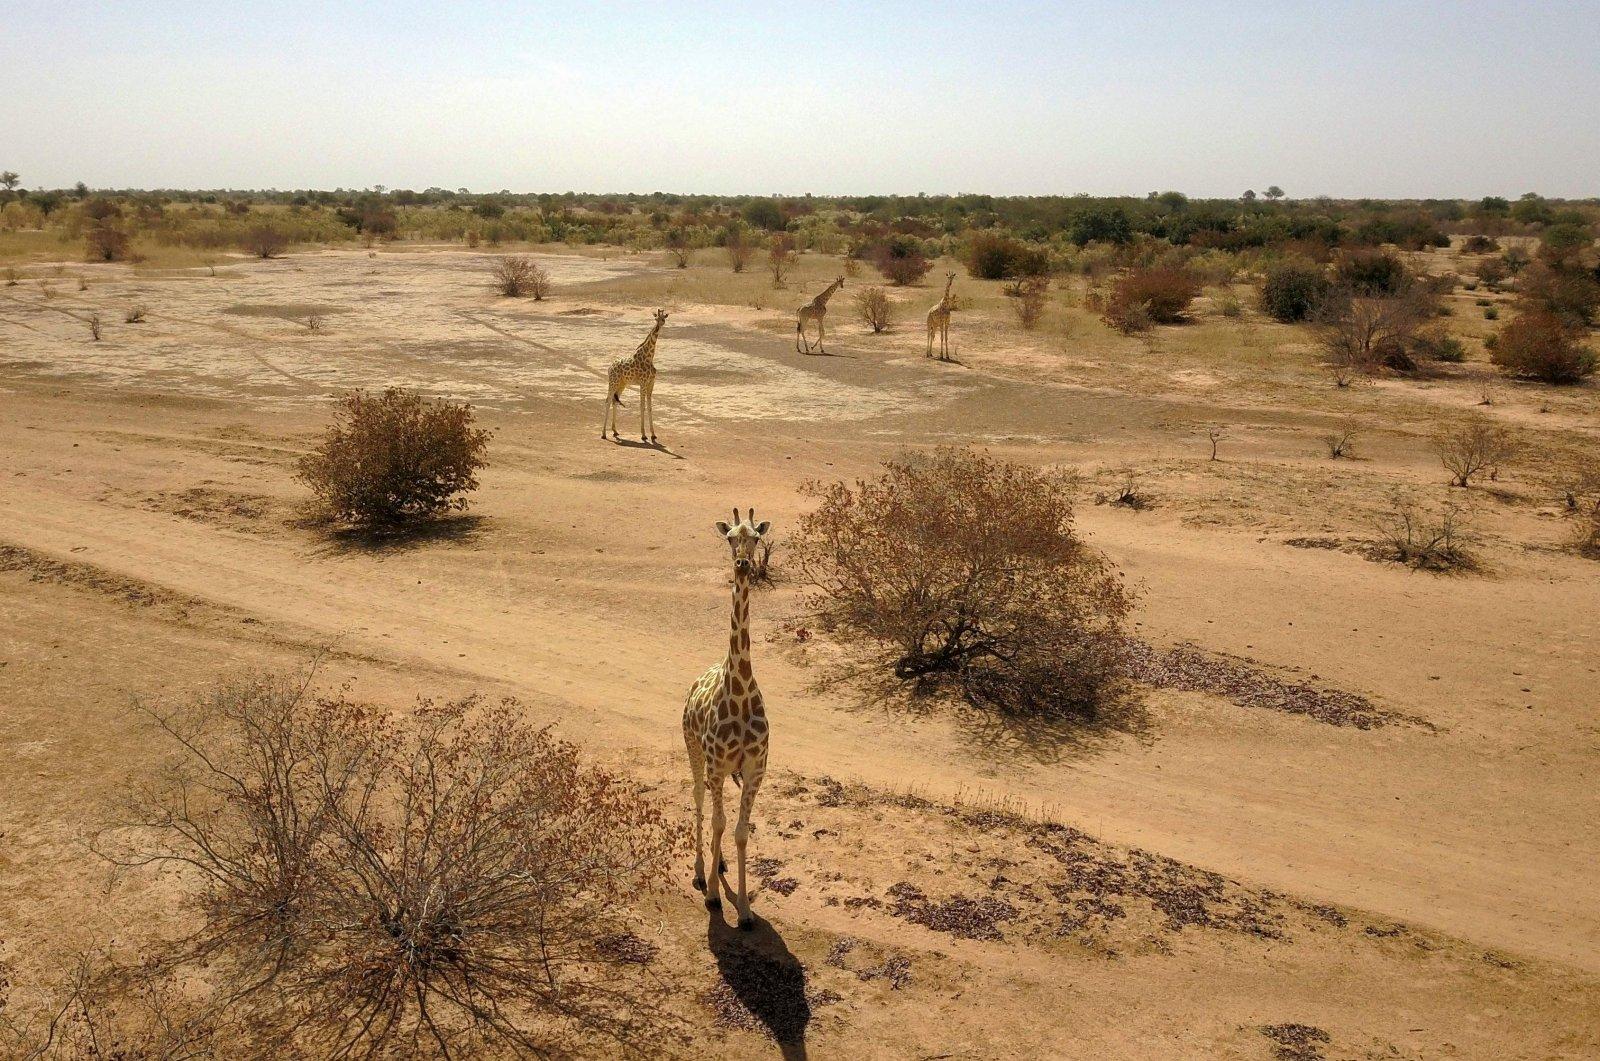 An aerial view shows giraffes in Koure, Niger on Feb. 25, 2020. (Photo by Souleymane Ag Anara via AFP)